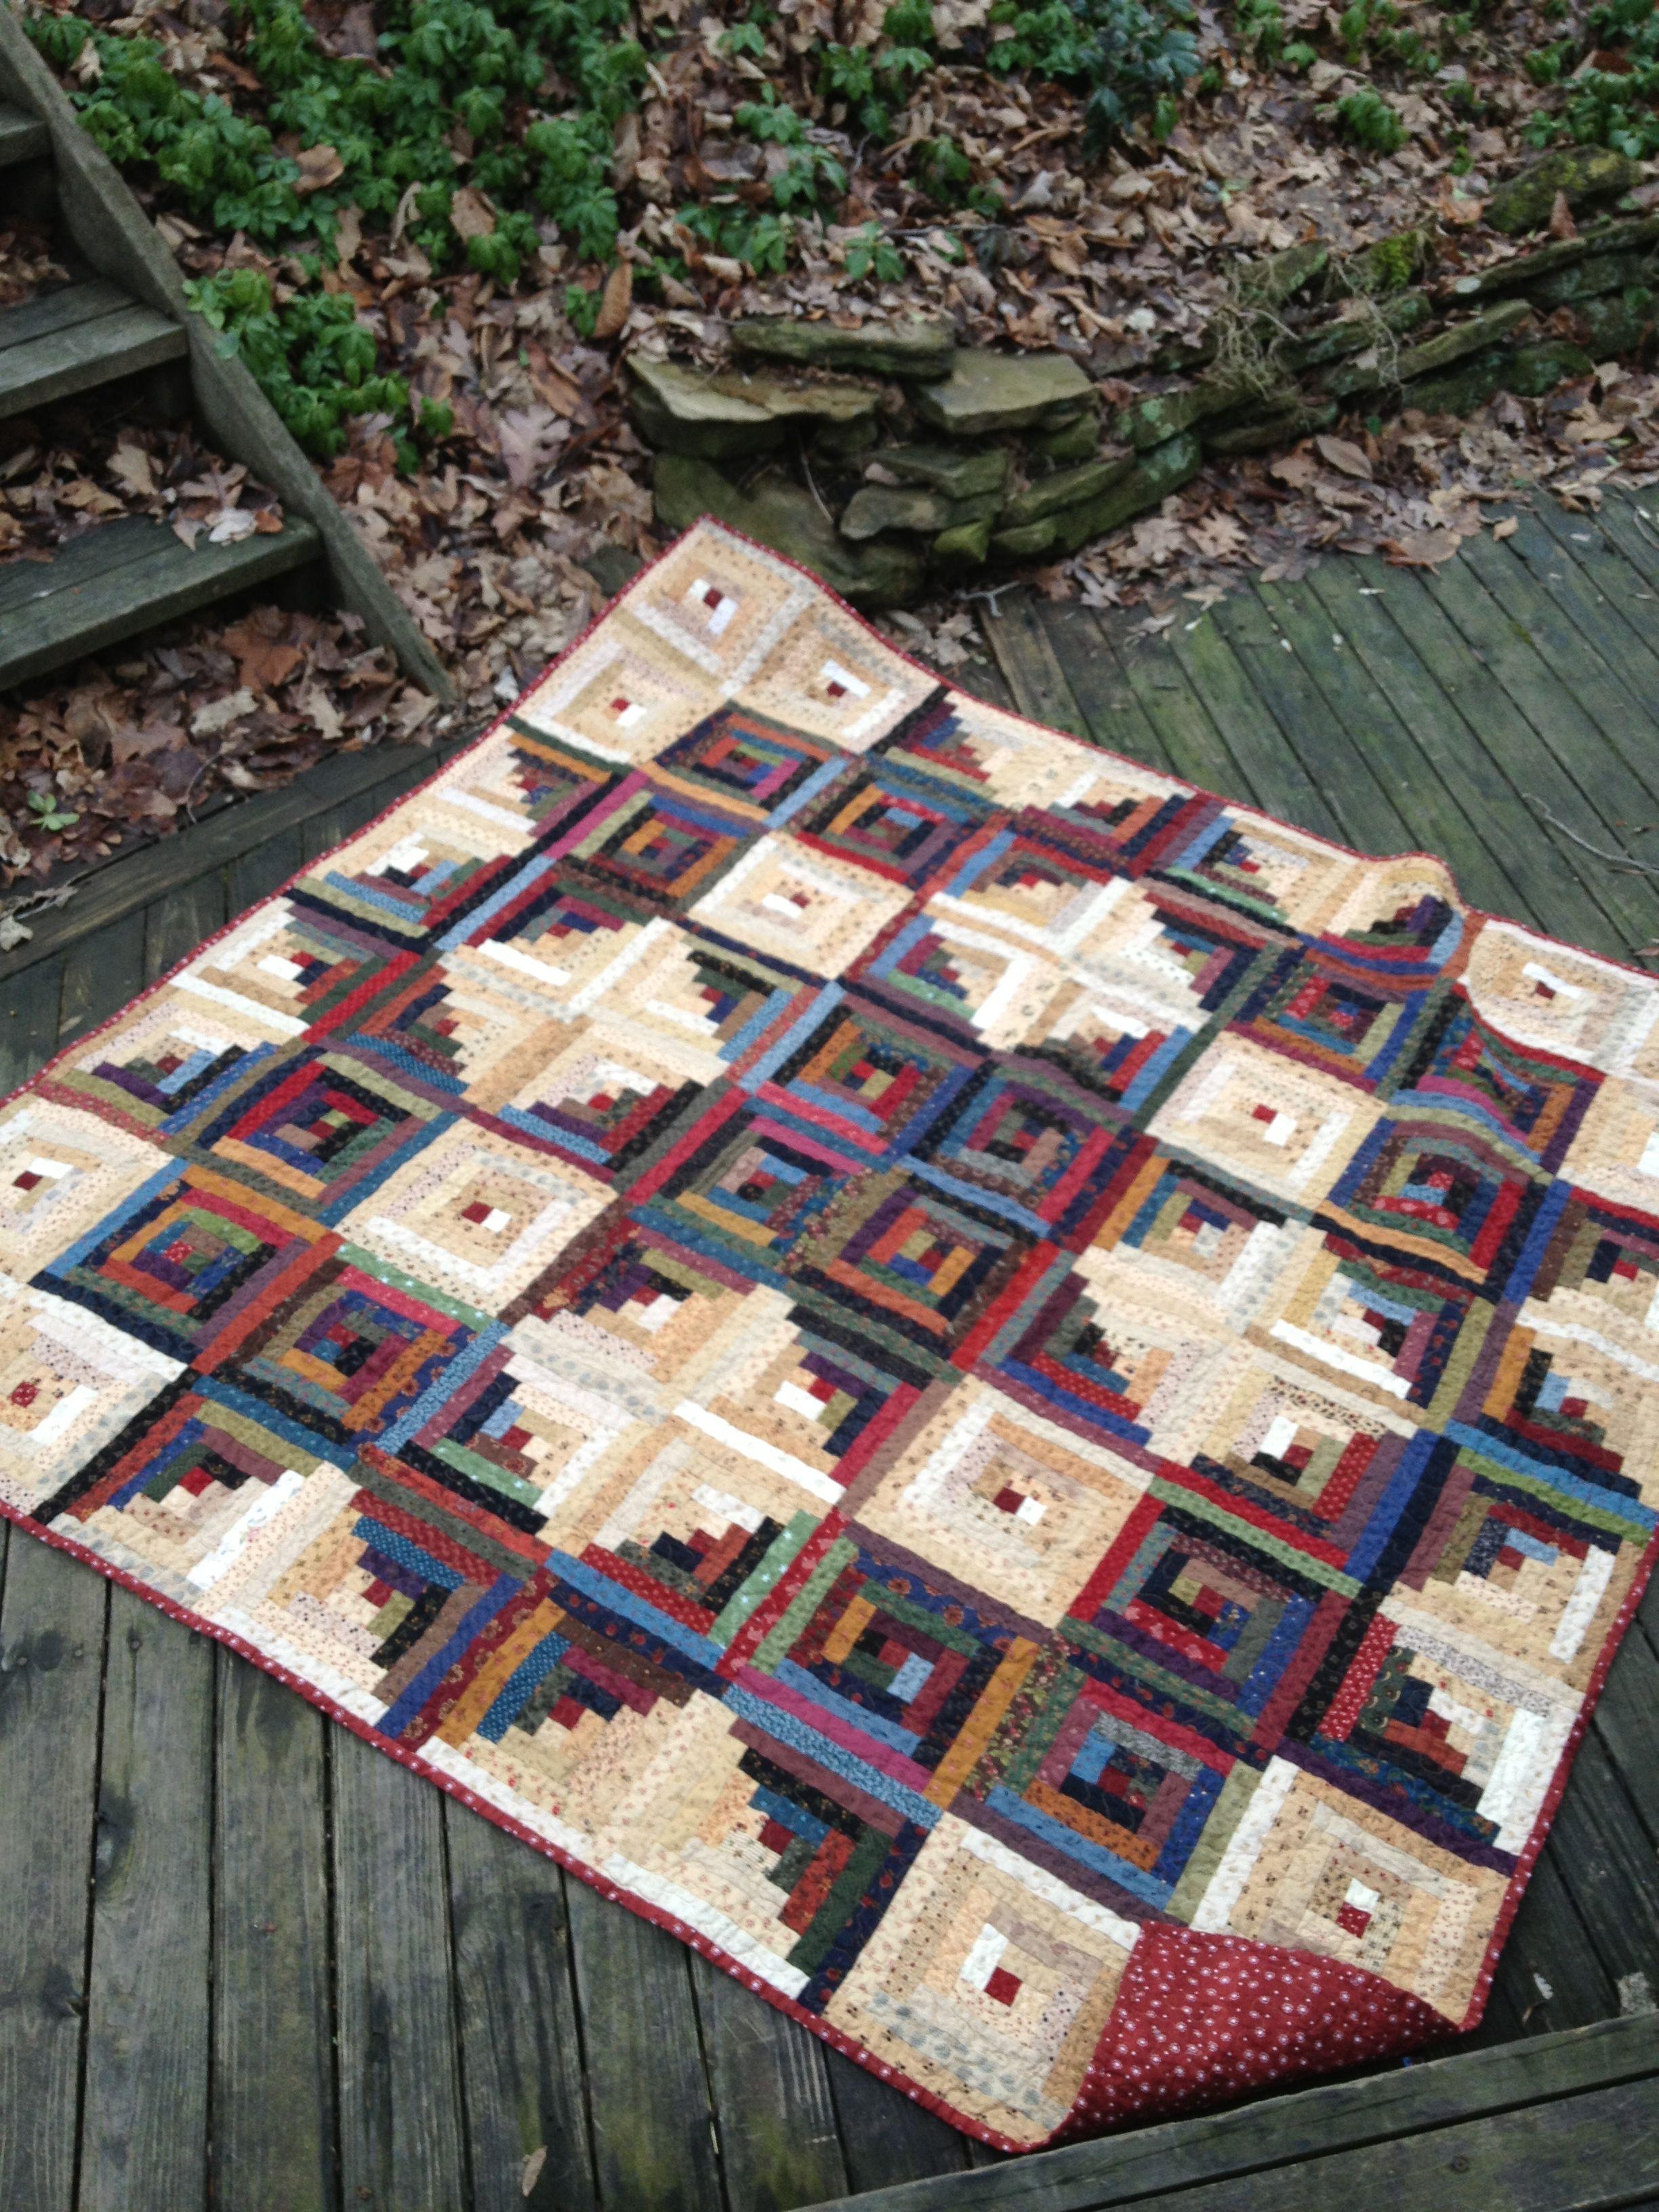 Broken Star Log Cabin Edyta Sitar Pattern My Quilts Pinterest